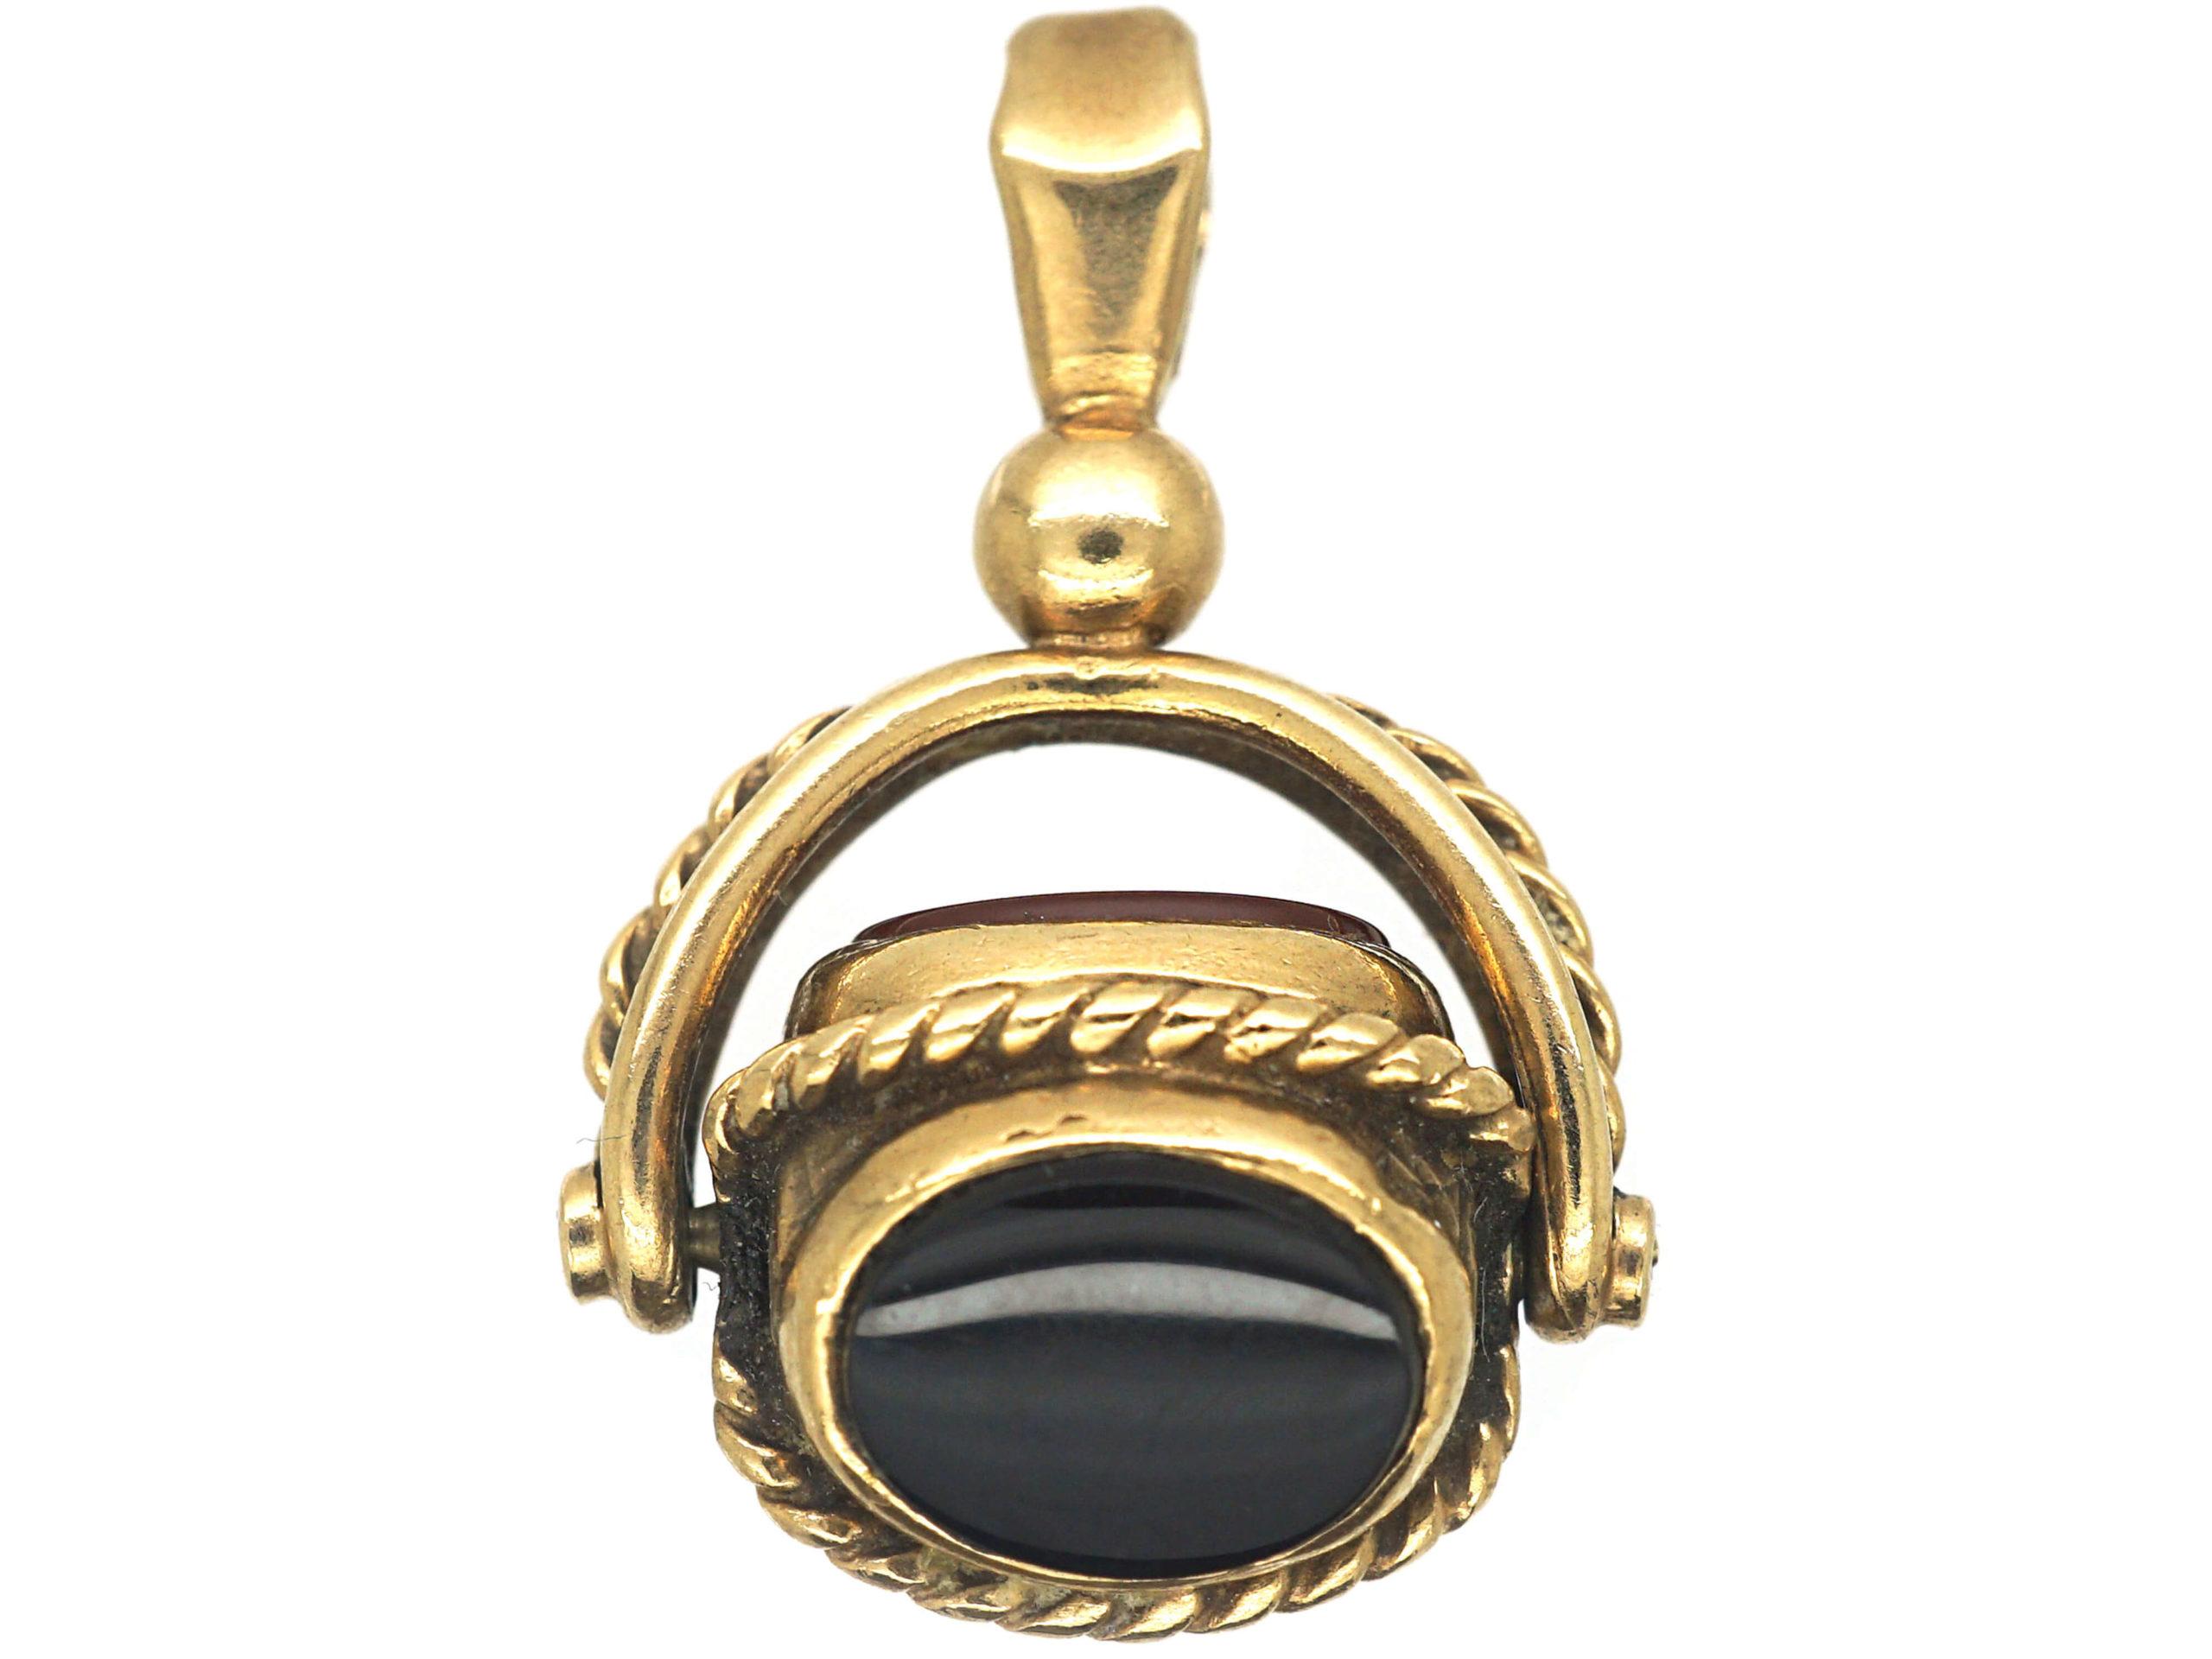 9ct Gold Triple Swivel Seal